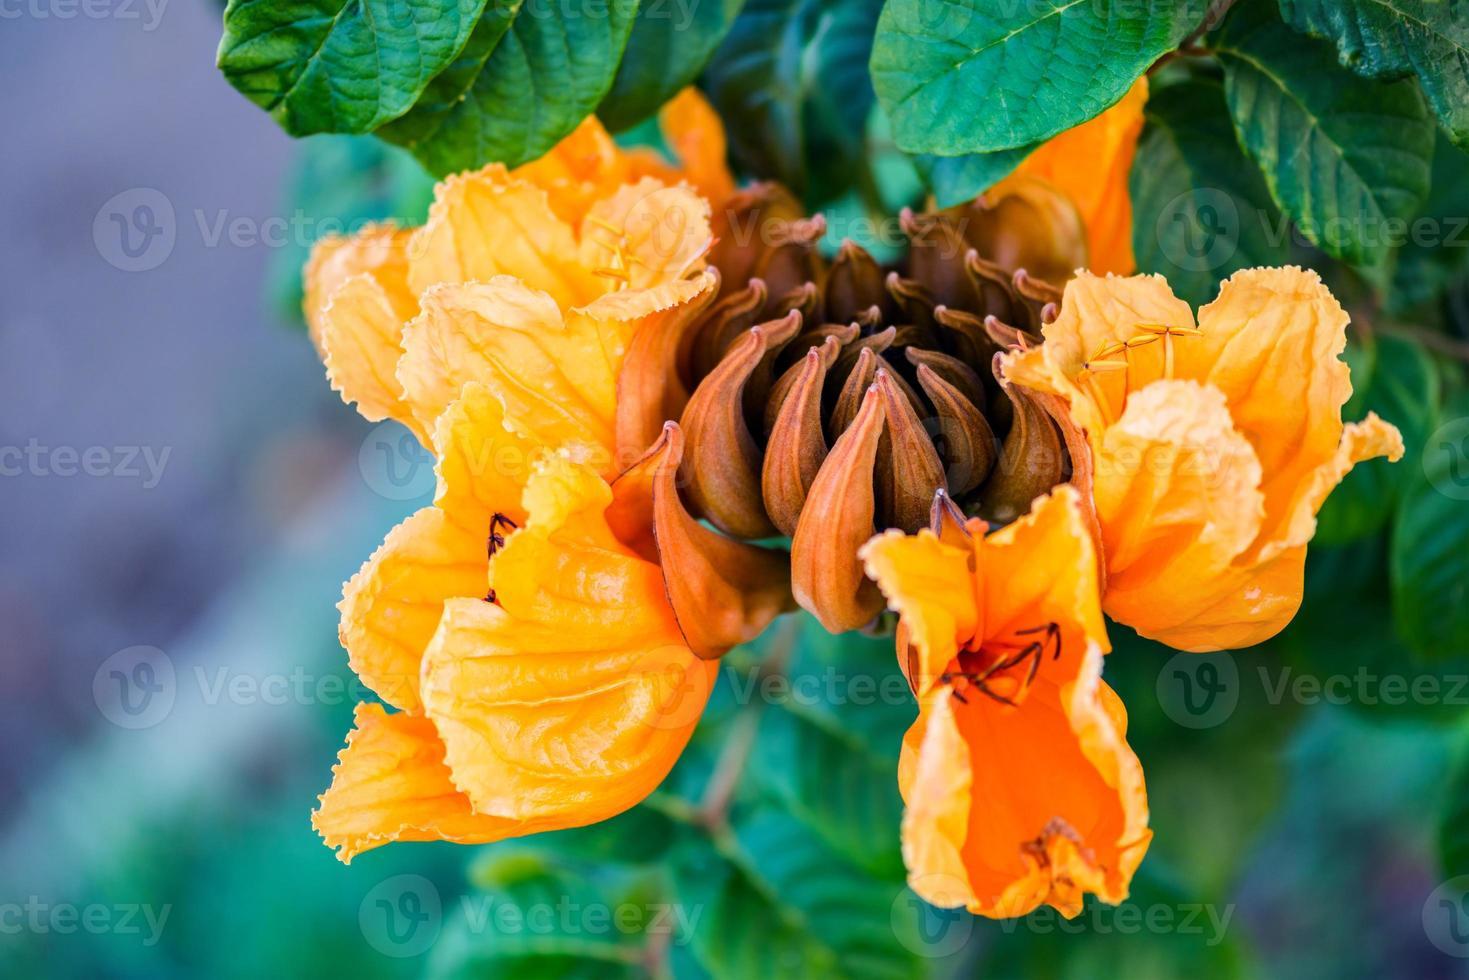 dekorative afrikanische Tulpenbaumblumenflamme des Waldes foto